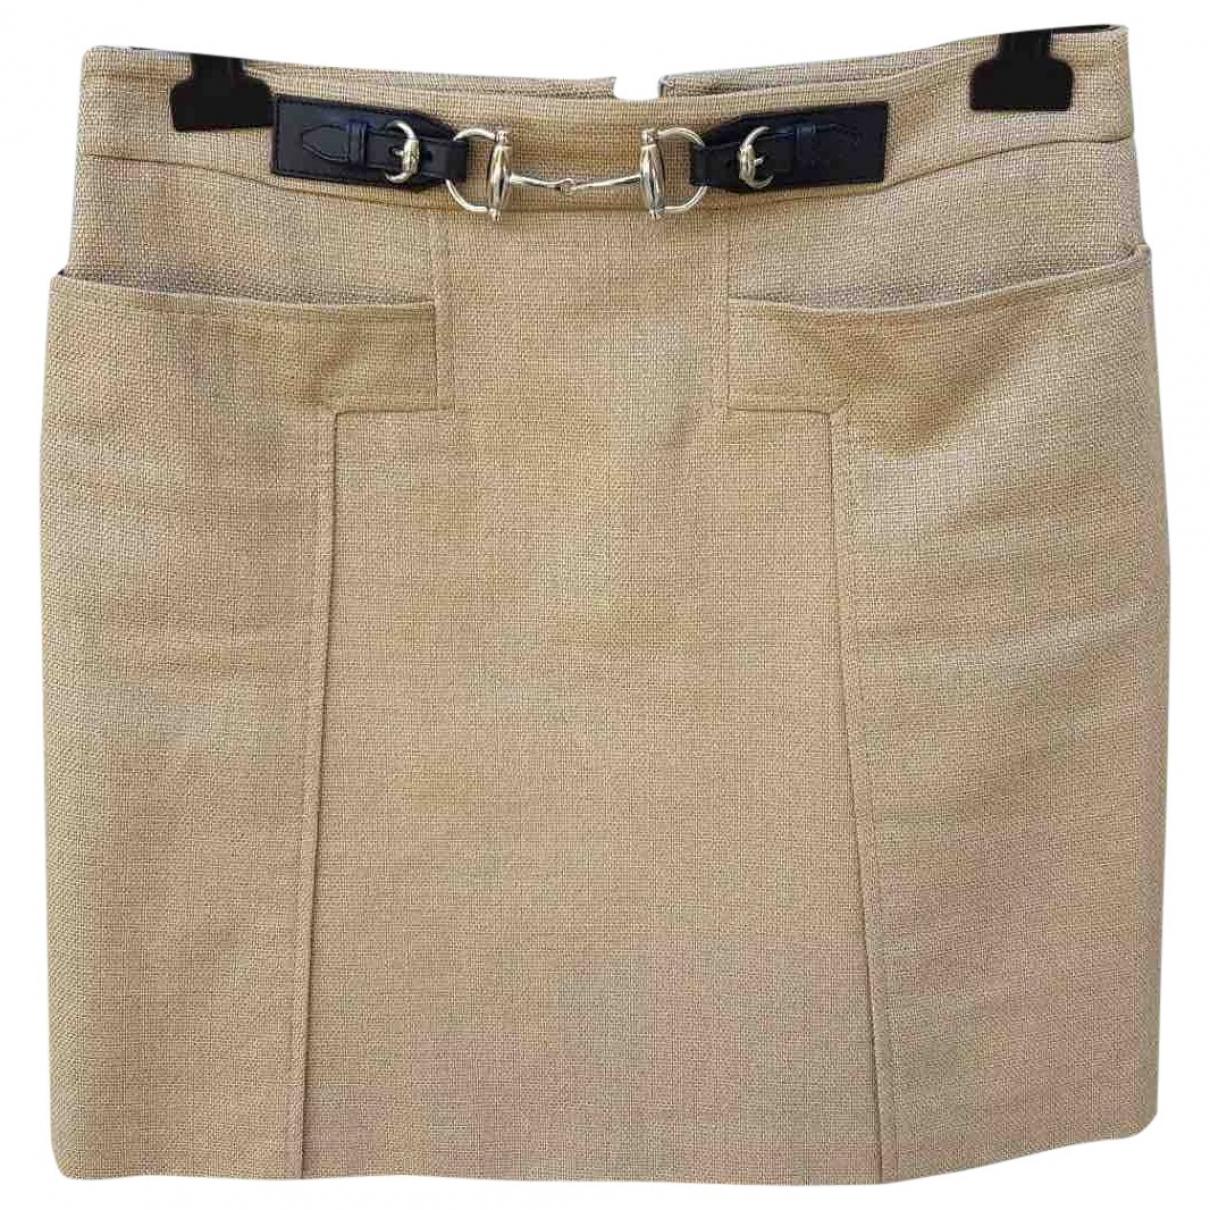 Gucci \N Beige Cotton skirt for Women 42 IT